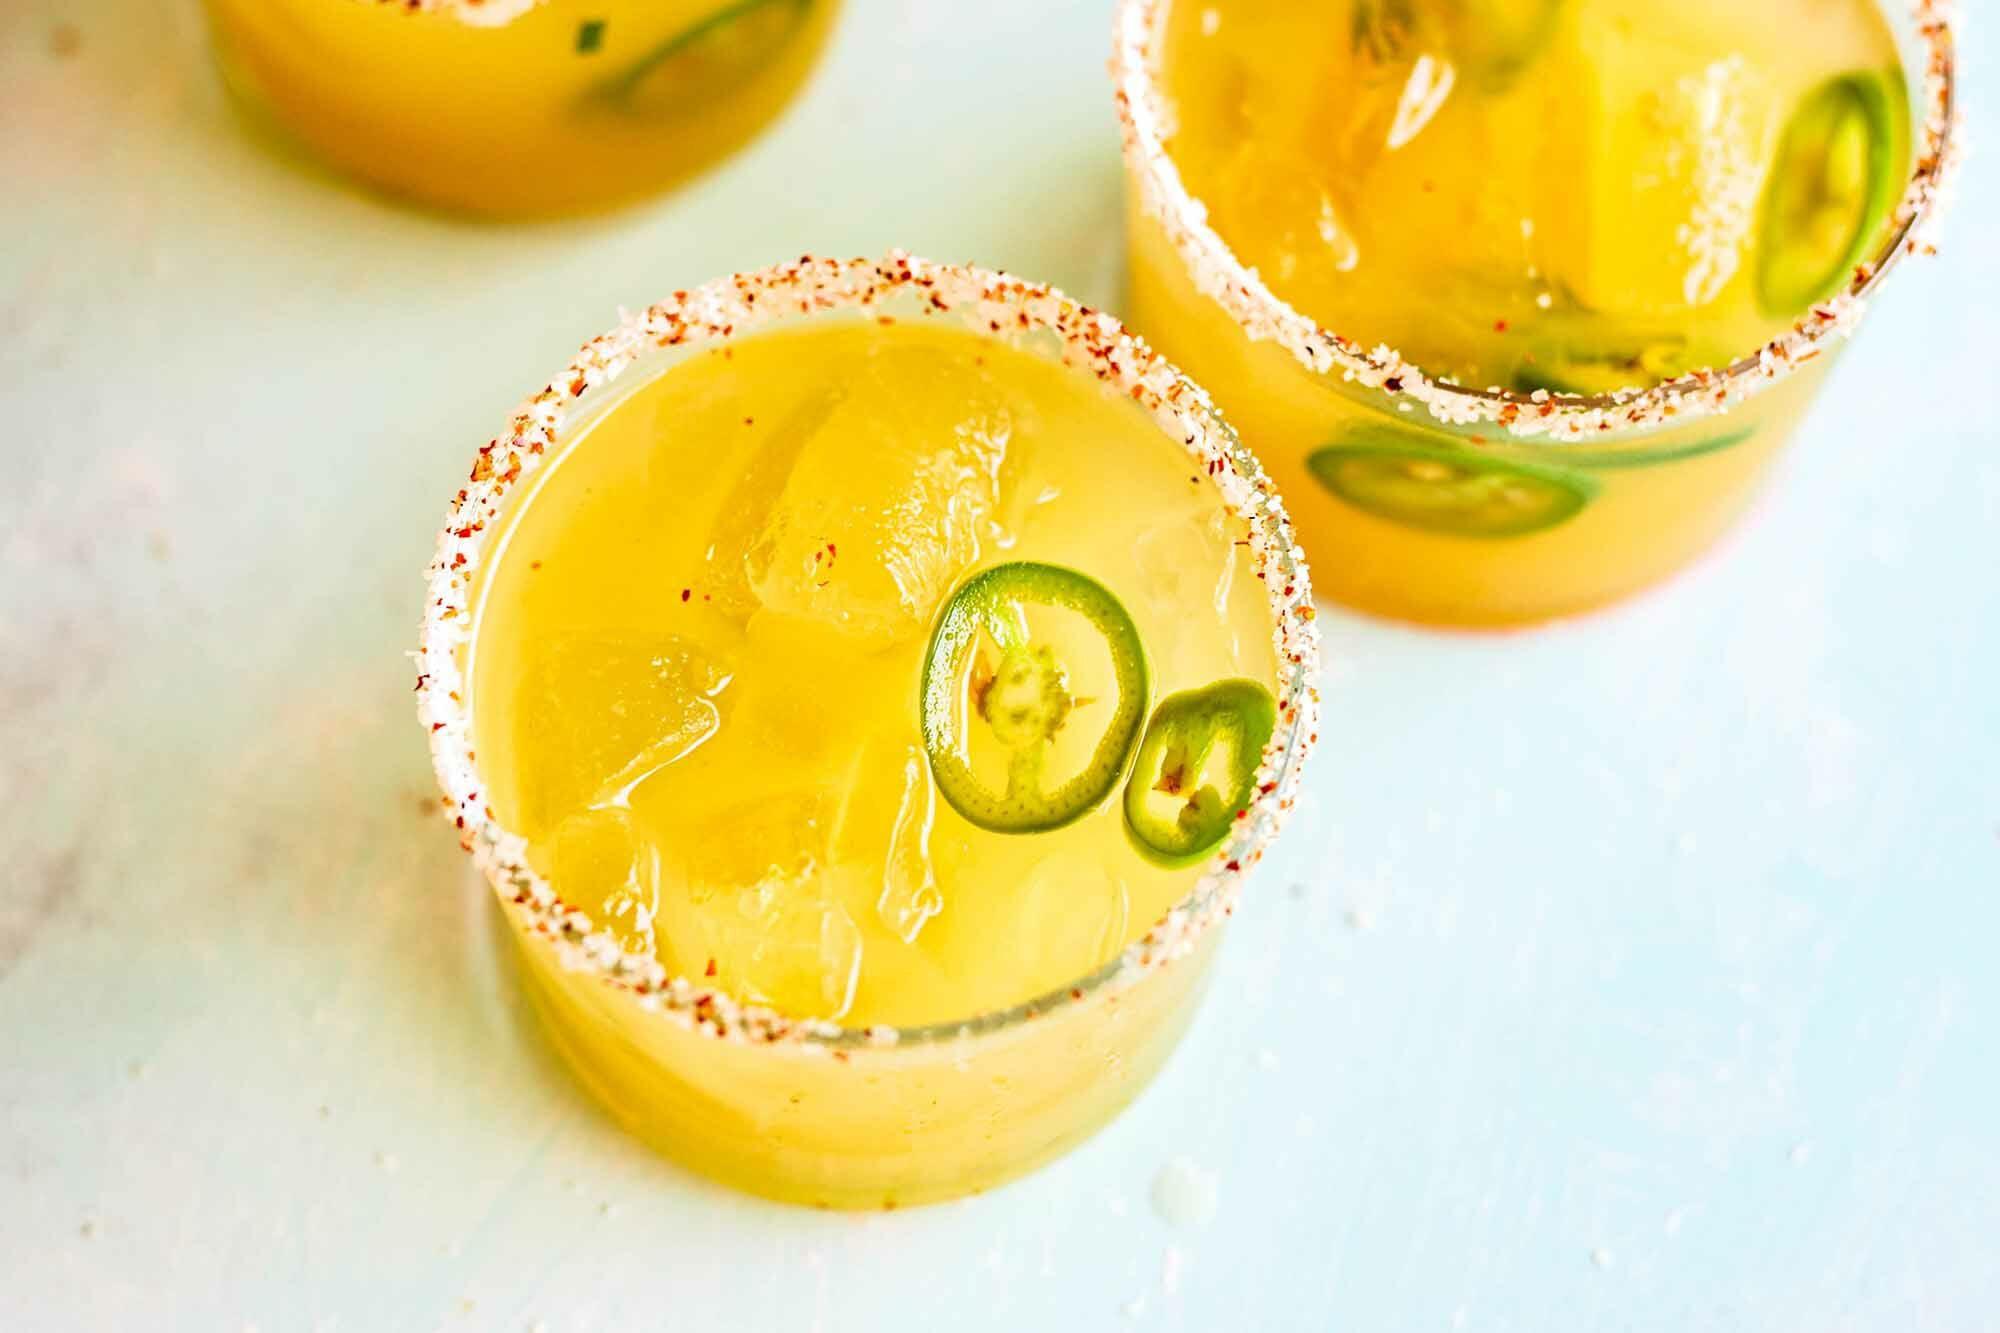 Pineapple Jalapeño Pitcher Margaritas Recipe